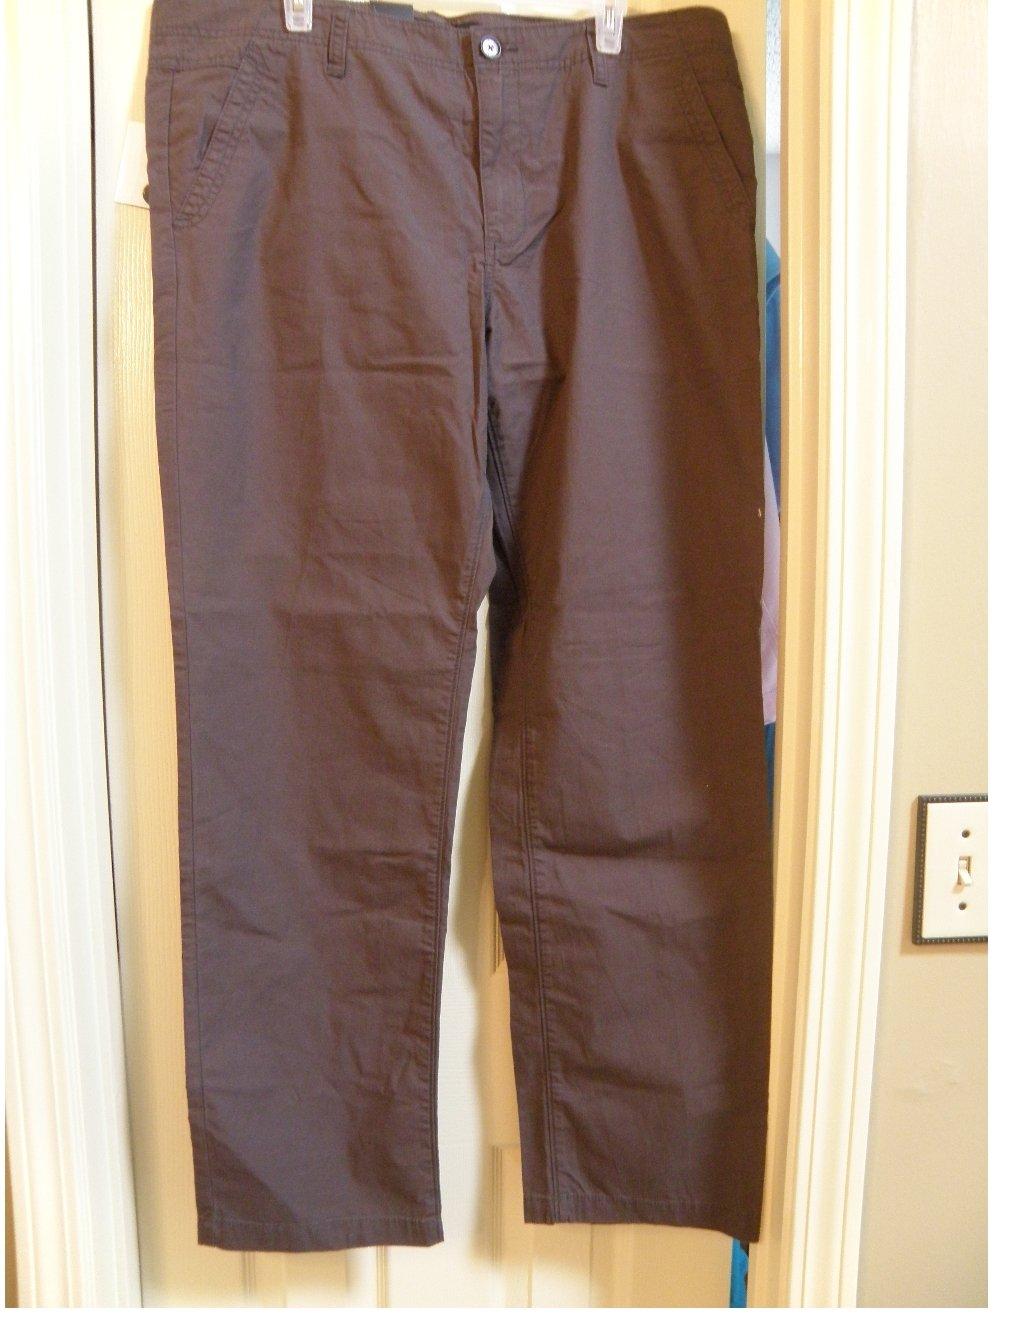 NEW Calvin Klein Jeans Lightweight Mens Pants in Brown or Debris 38 x 32 $79.50